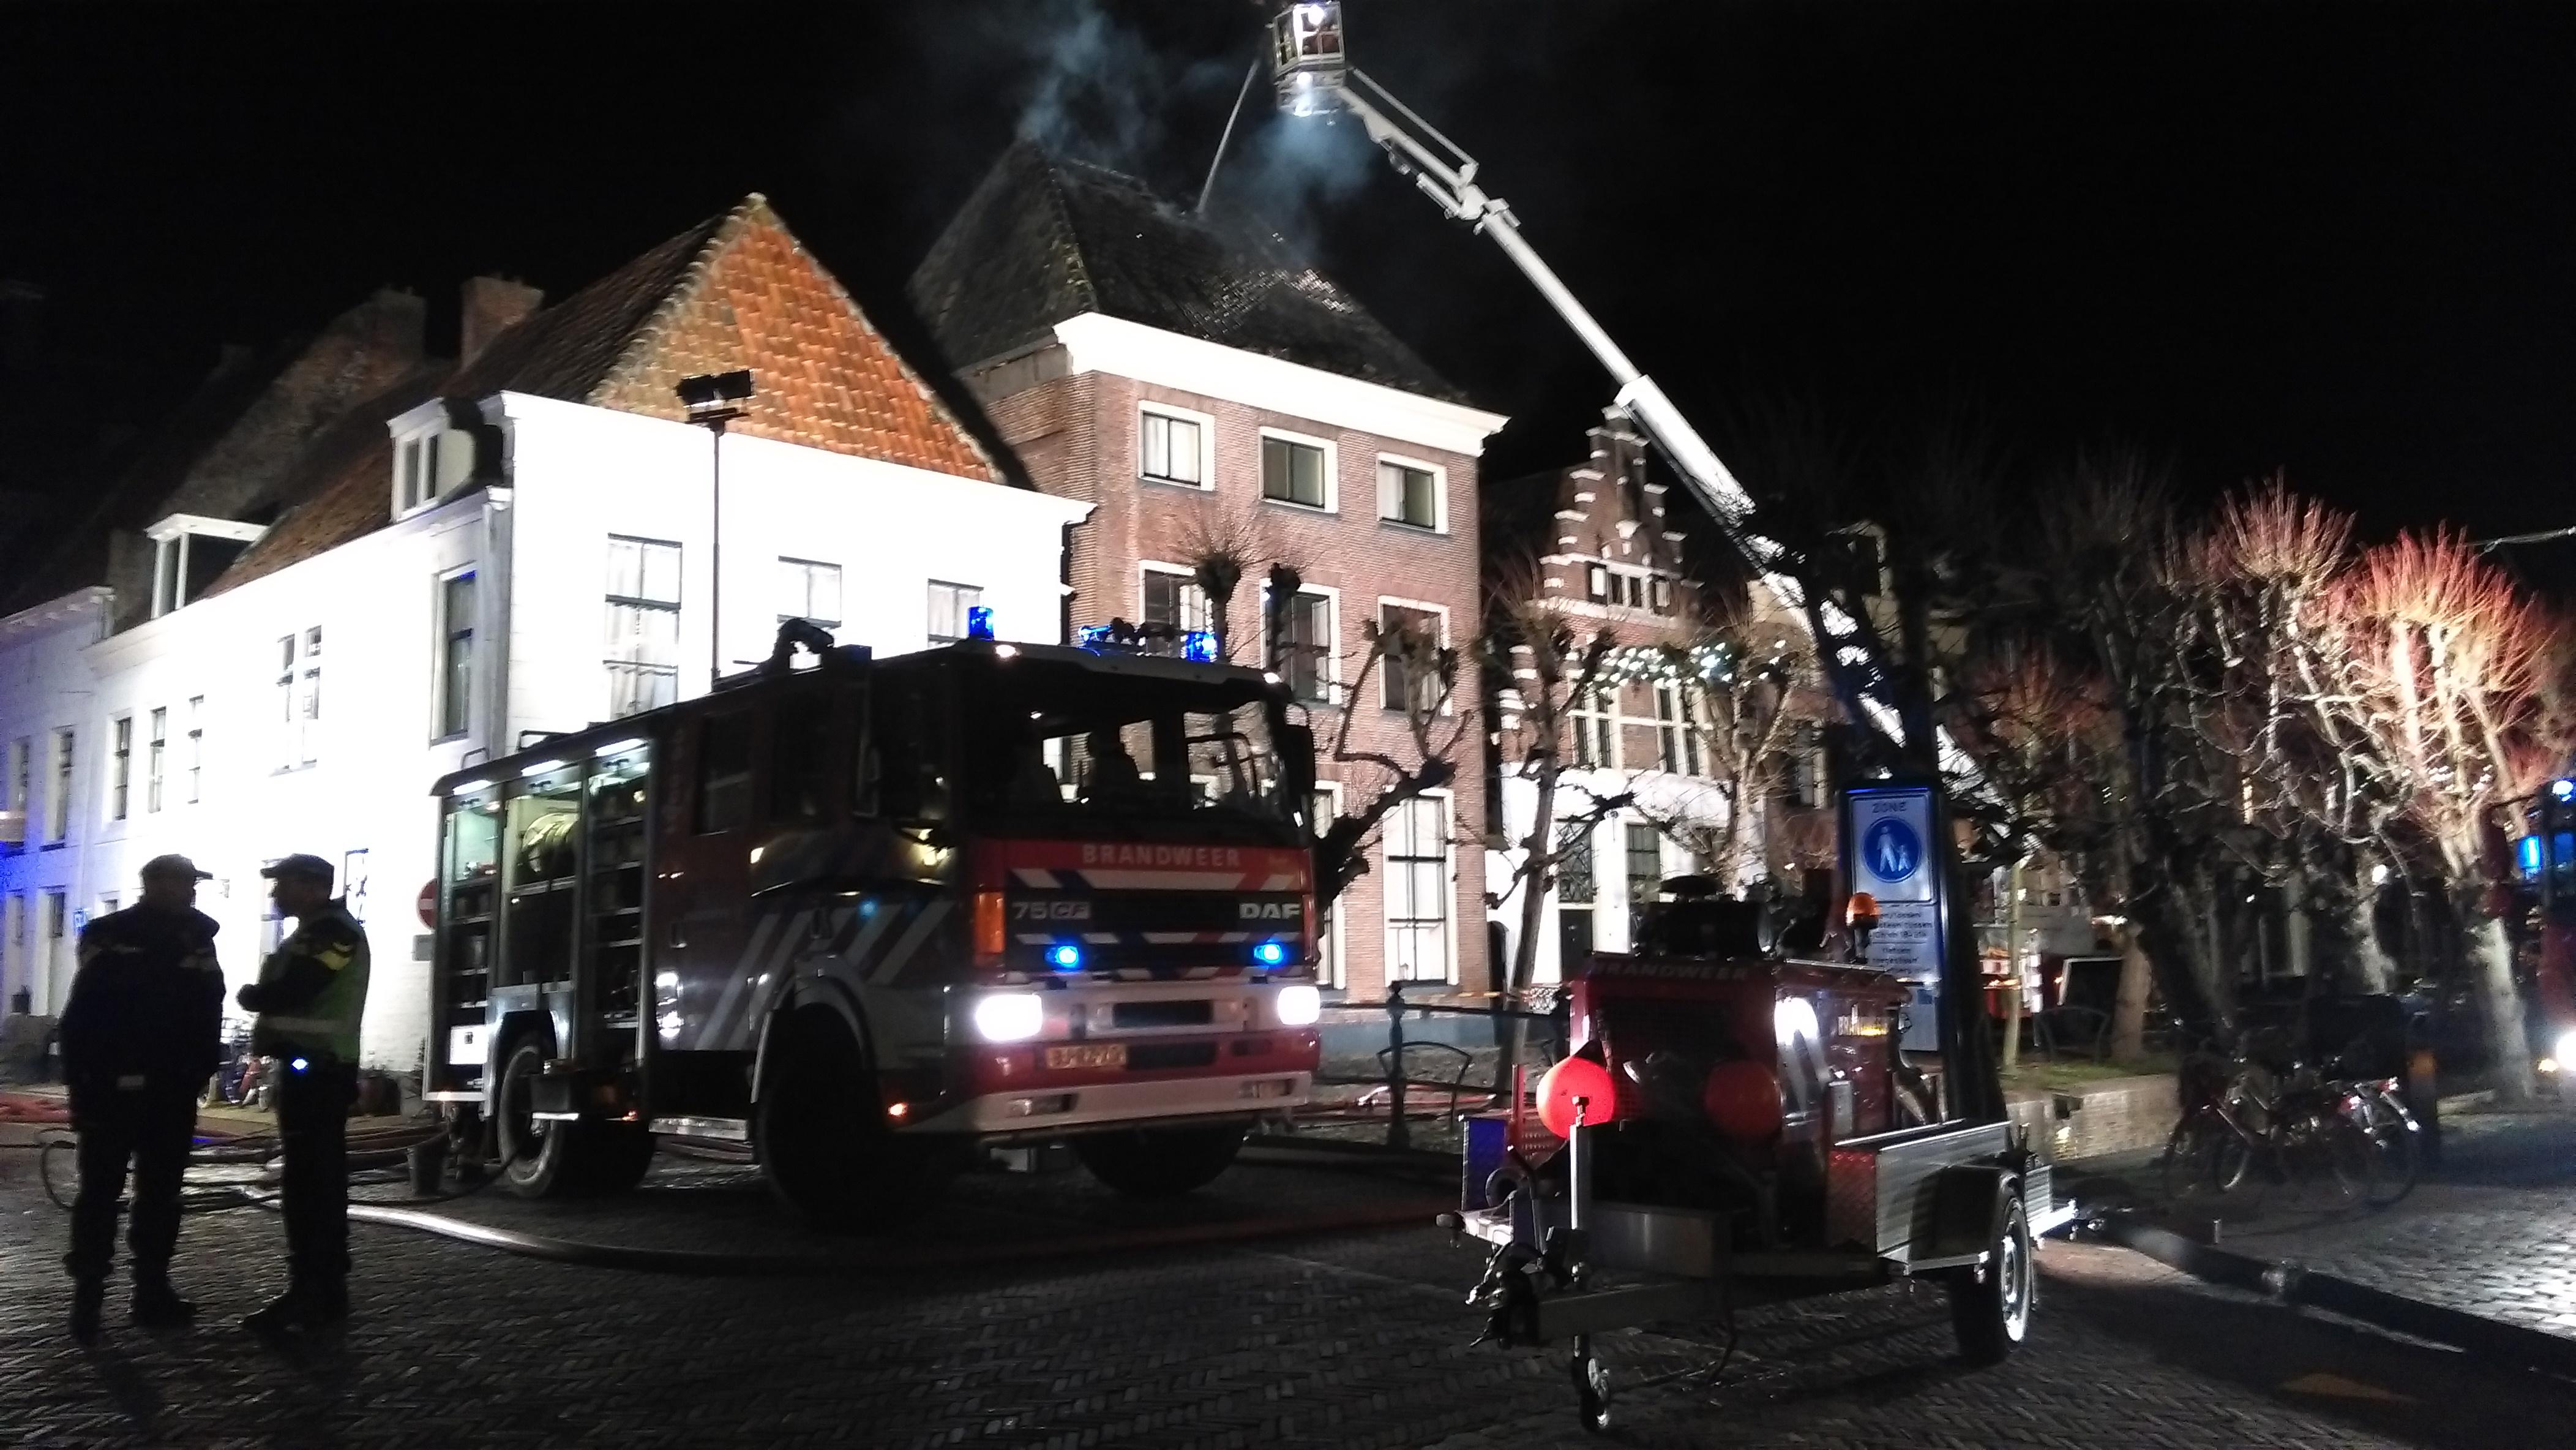 Brand in historische binnenstad Elburg onder controle, deel pand verwoest - Omroep Gelderland